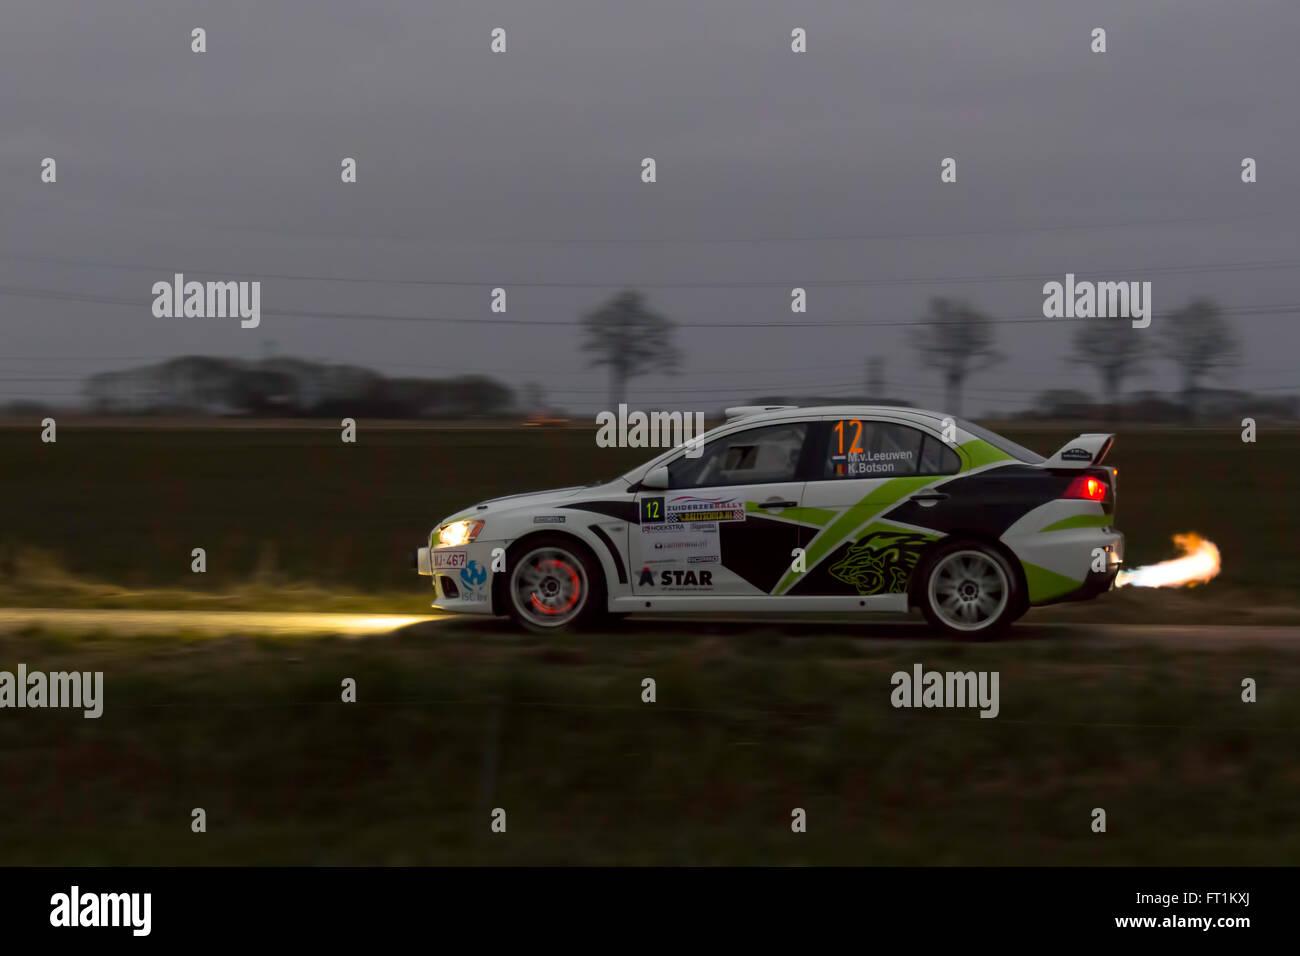 Mitsubishi Rally Car Stock Photo: 100841178 - Alamy